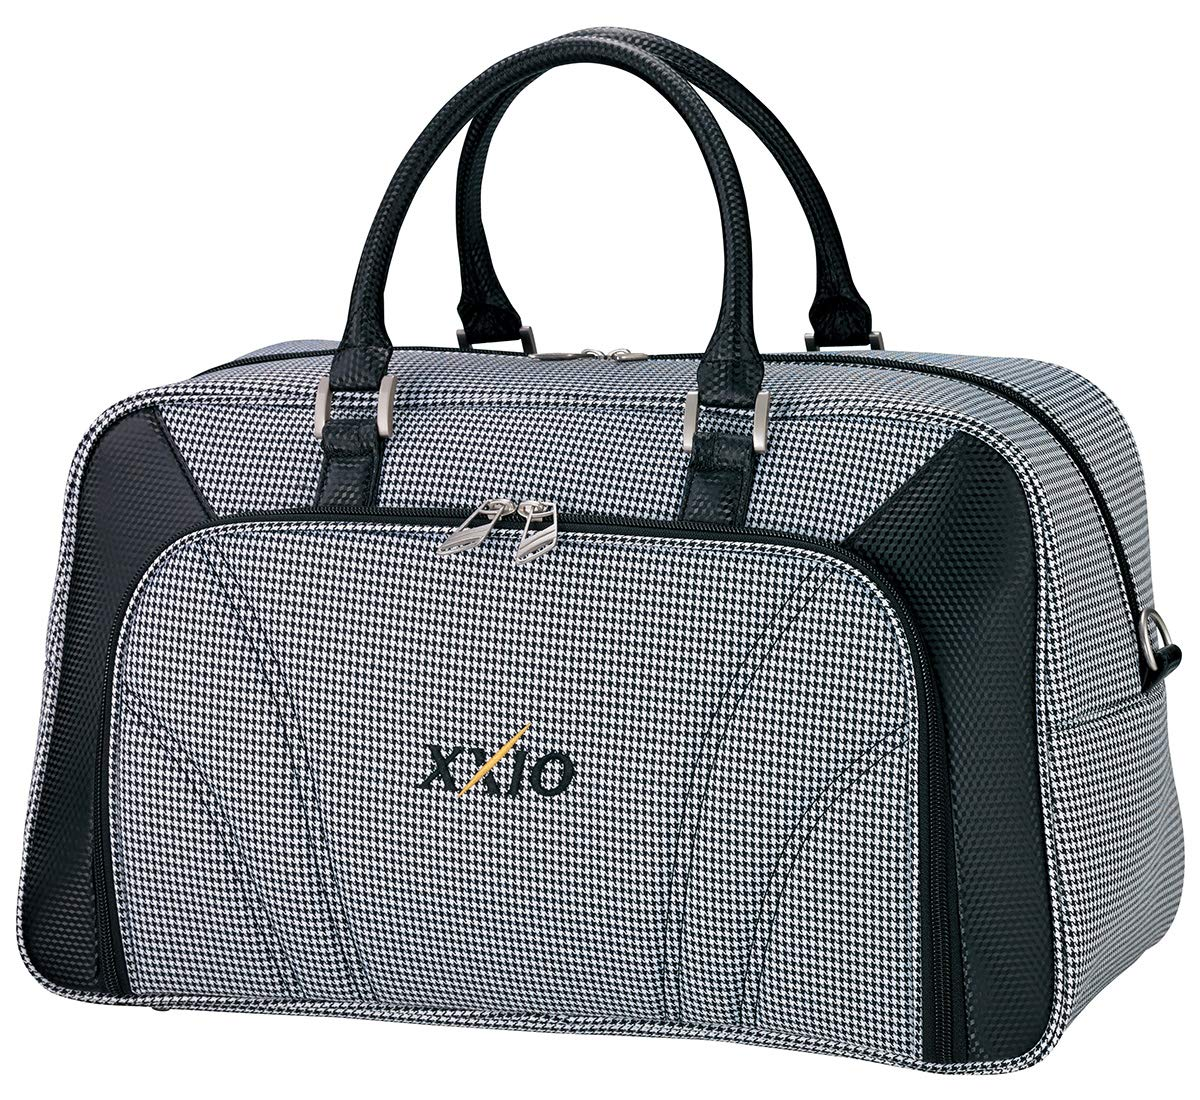 DUNLOP(ダンロップ) ボストンバッグ XXIO スポーツバッグ GGB-X105 チドリ   B07N82RXDN